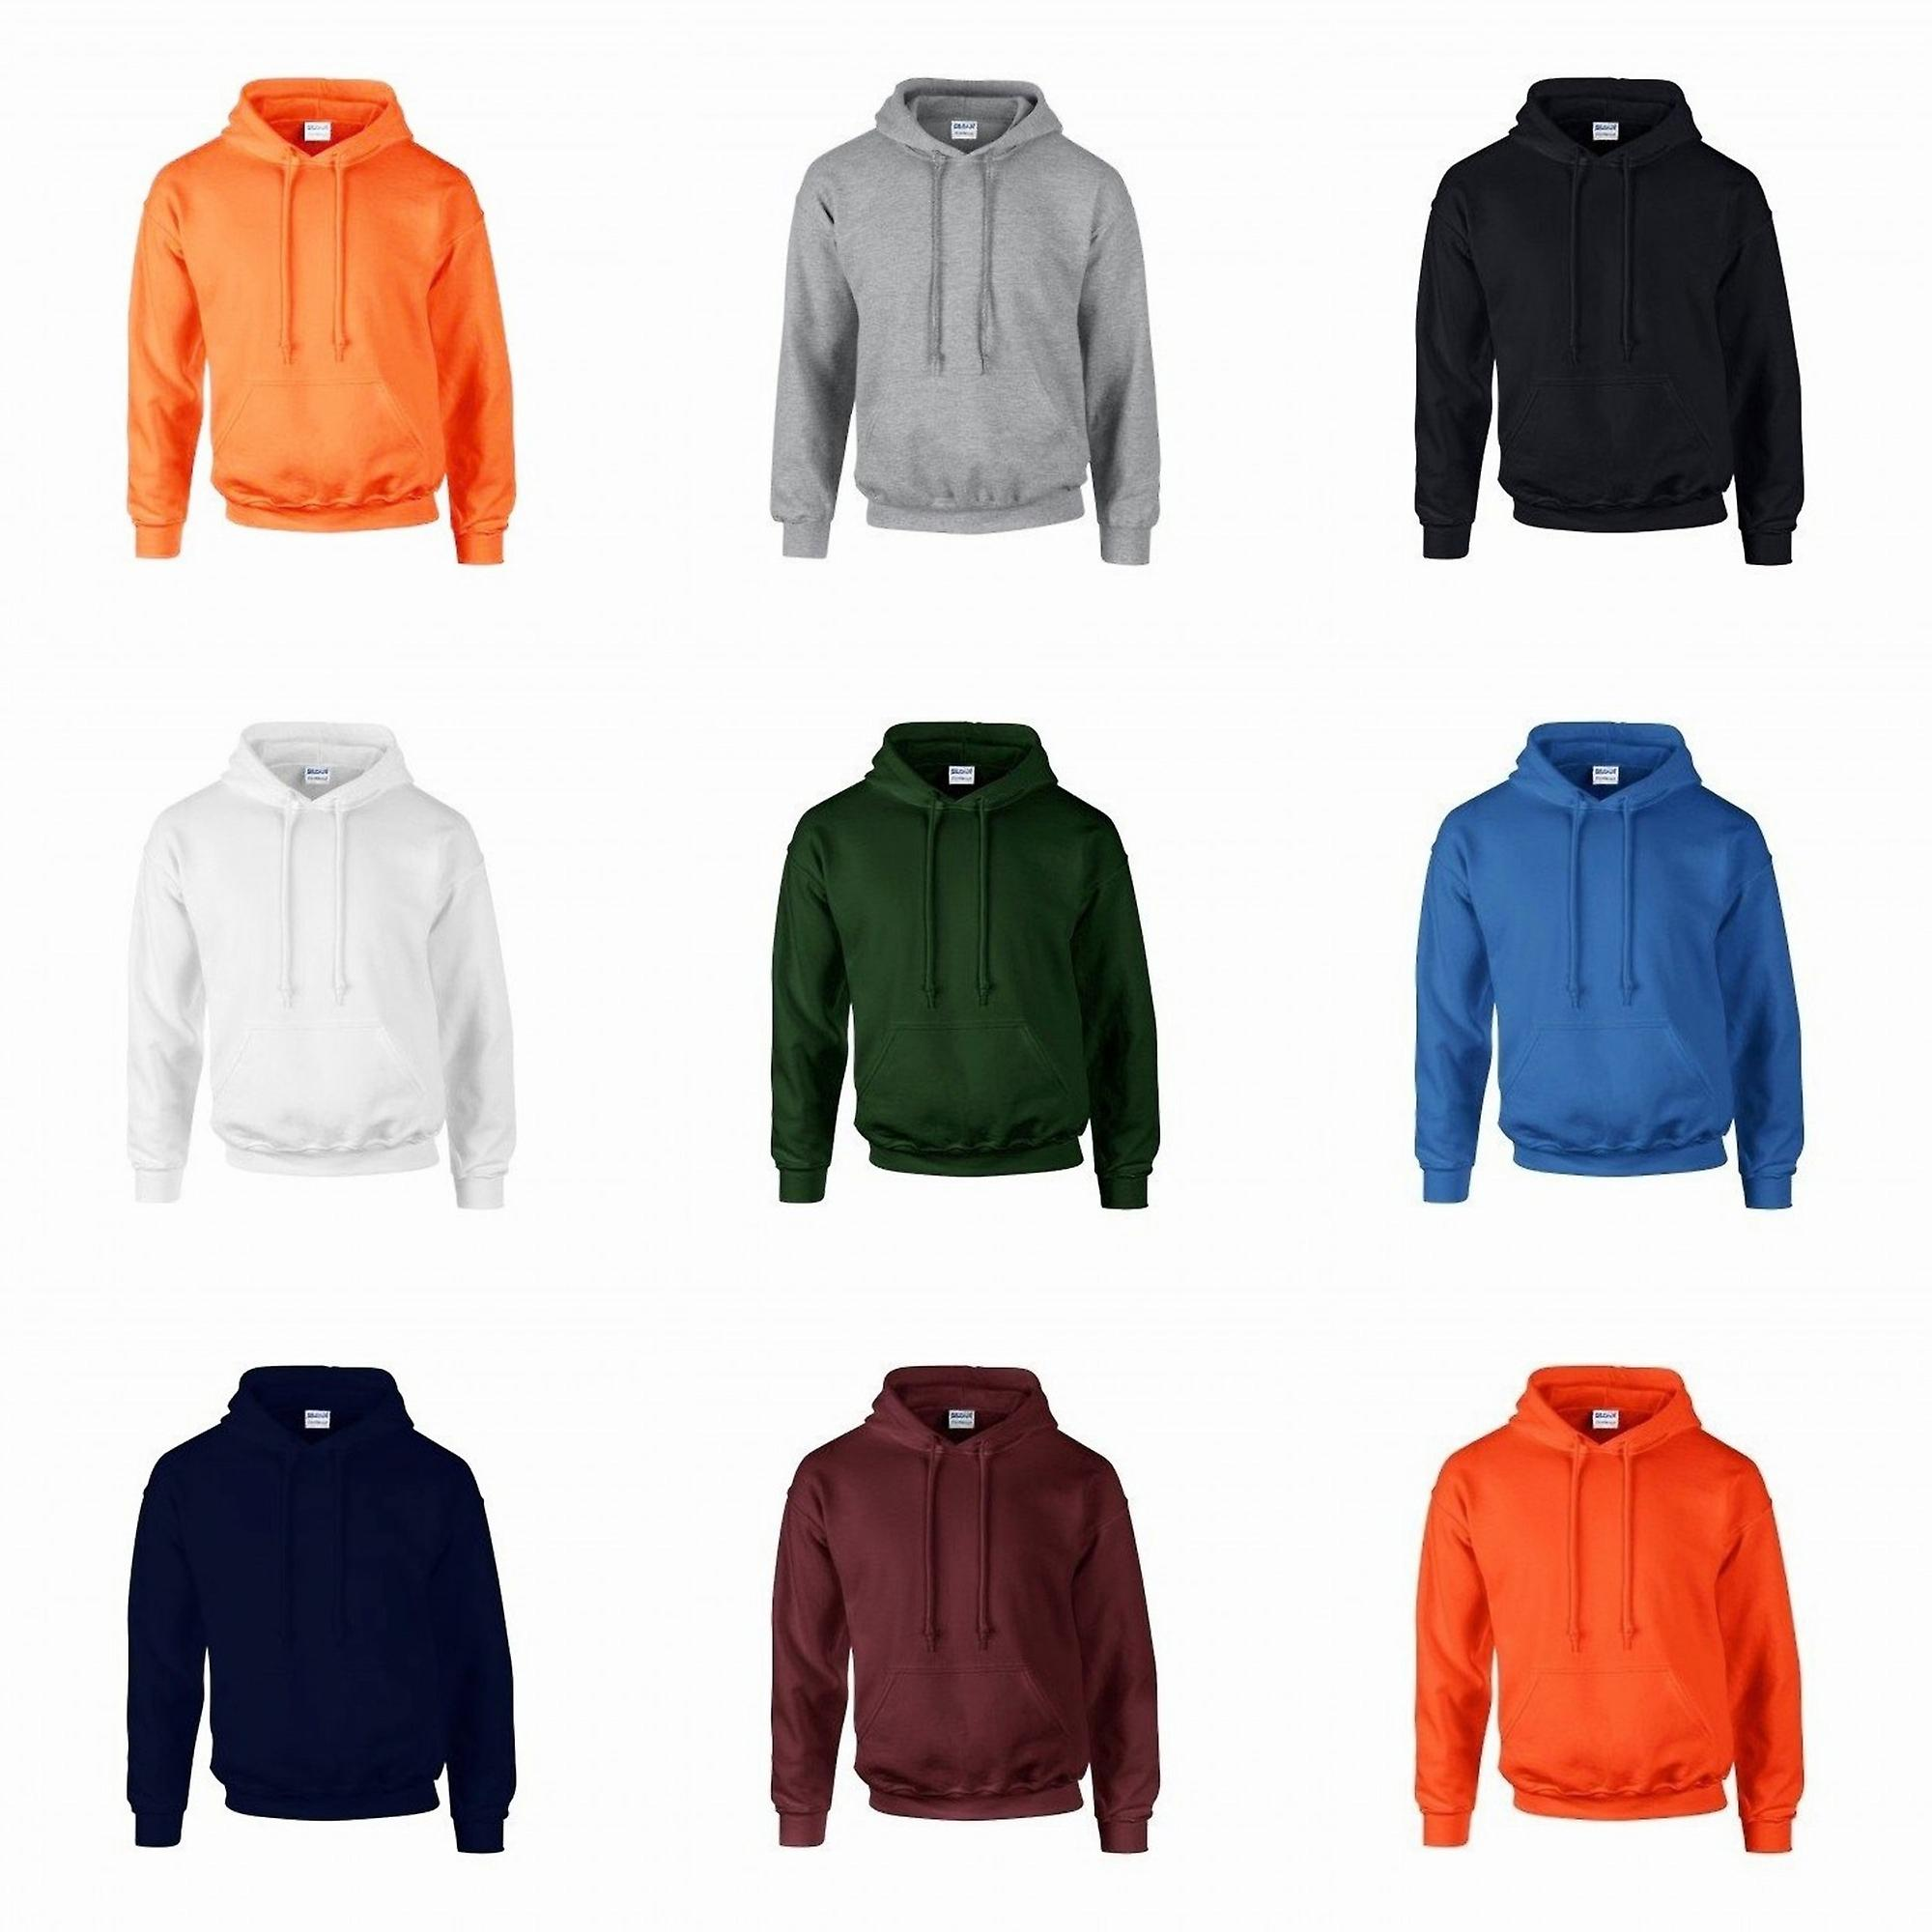 Gildan Ultra Blend Pullover Hooded Sweatshirt Safety Orange 2XL